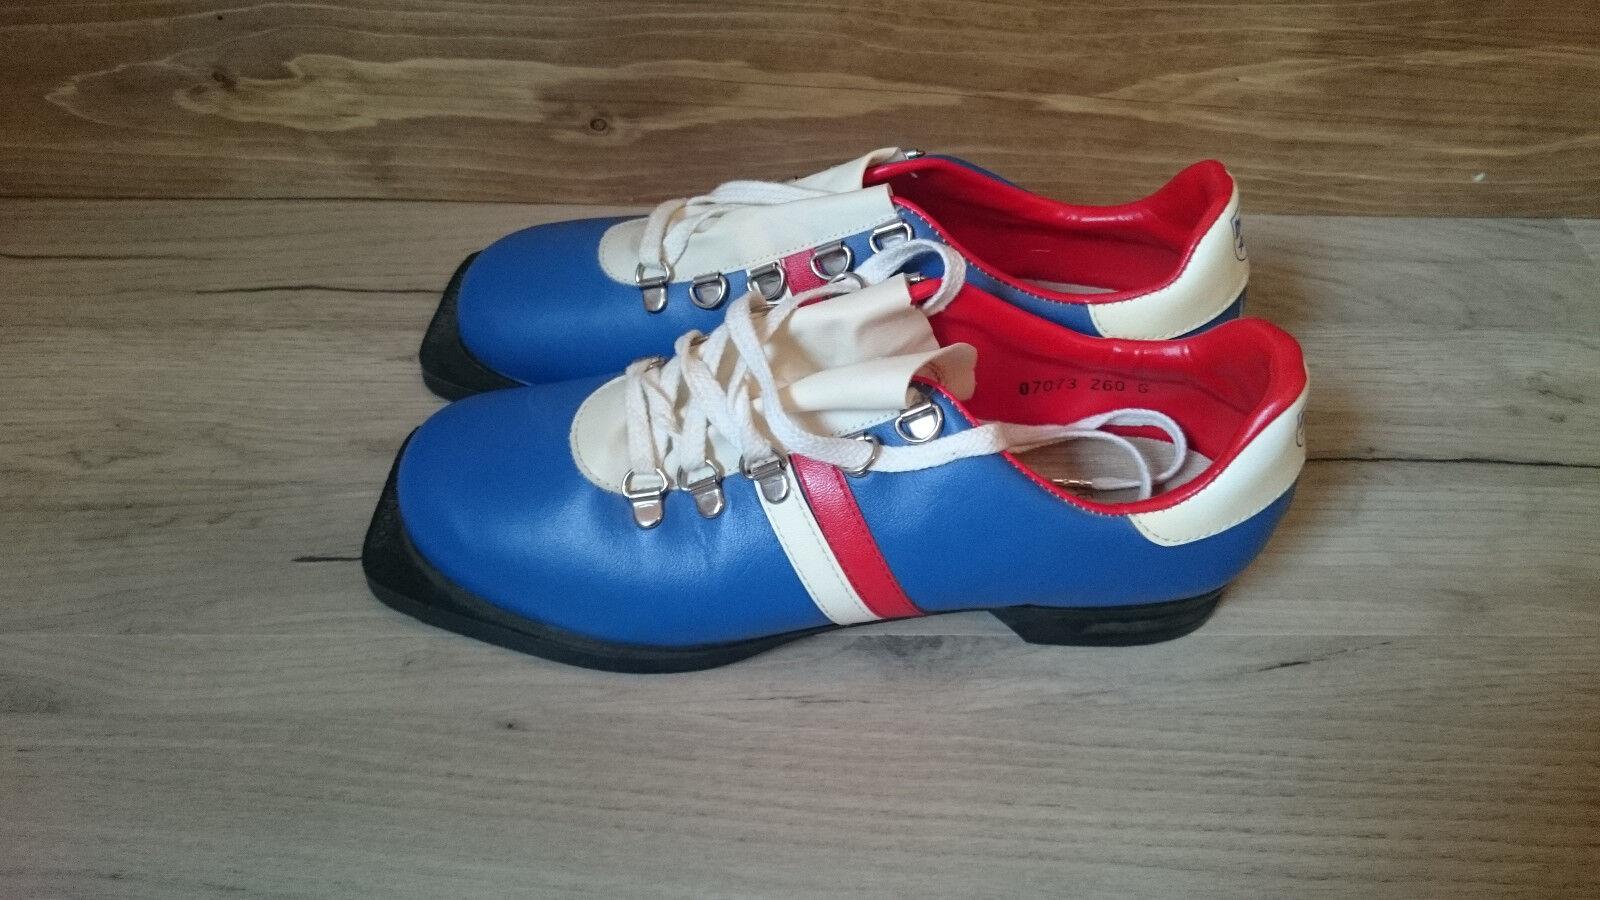 Vintage Cross country Ski Boots  botas